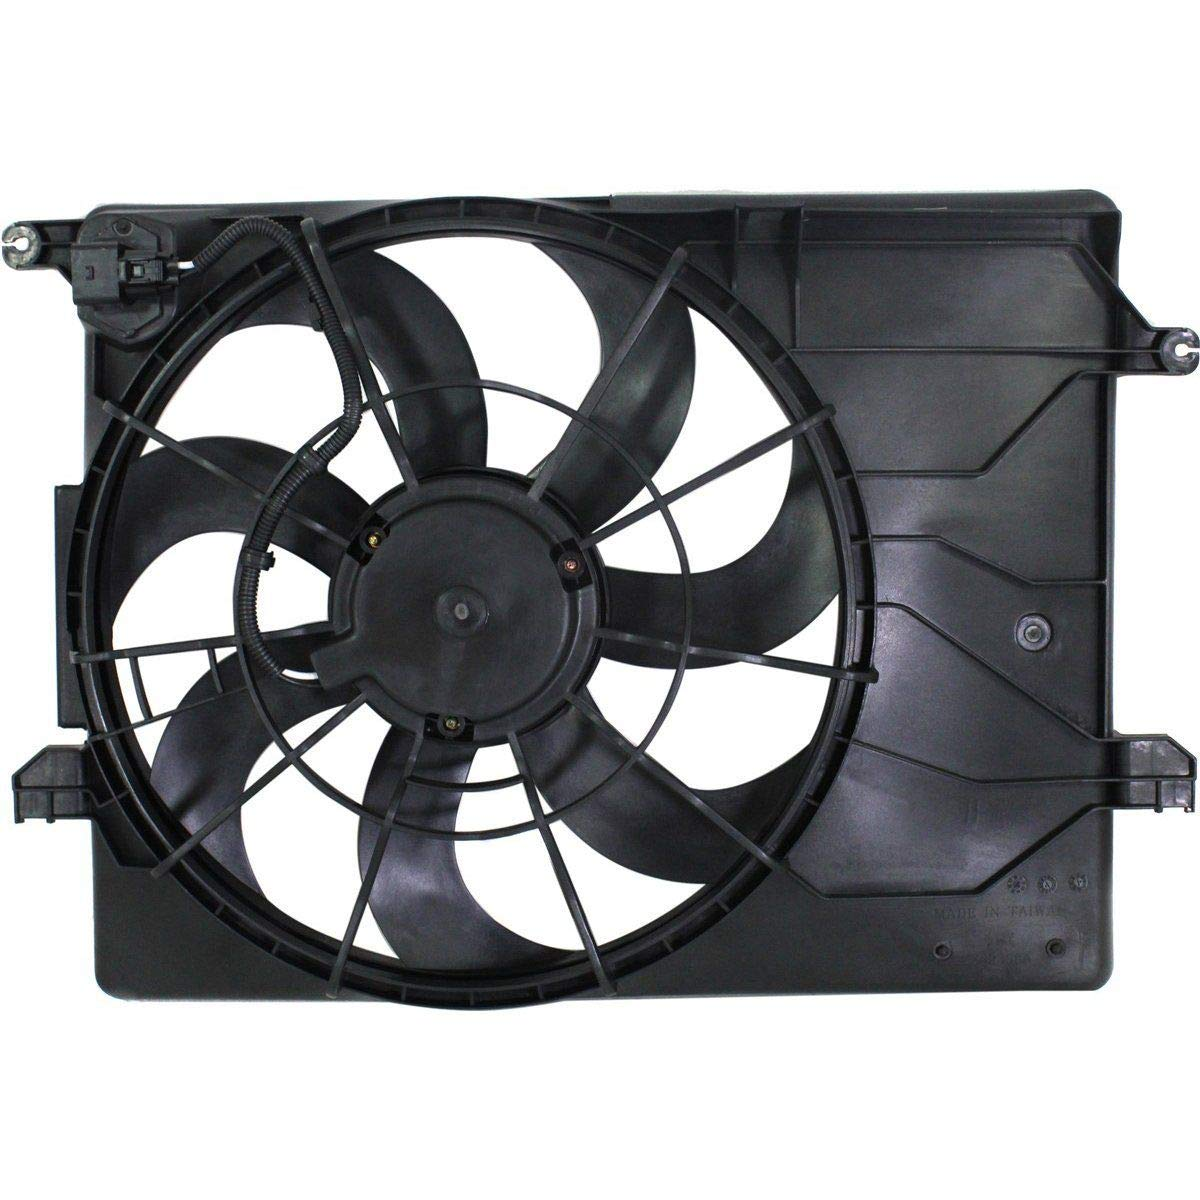 Radiator Cooling Fan For 2010-2013 Hyundai Tucson 2011-2013 Kia Sportage